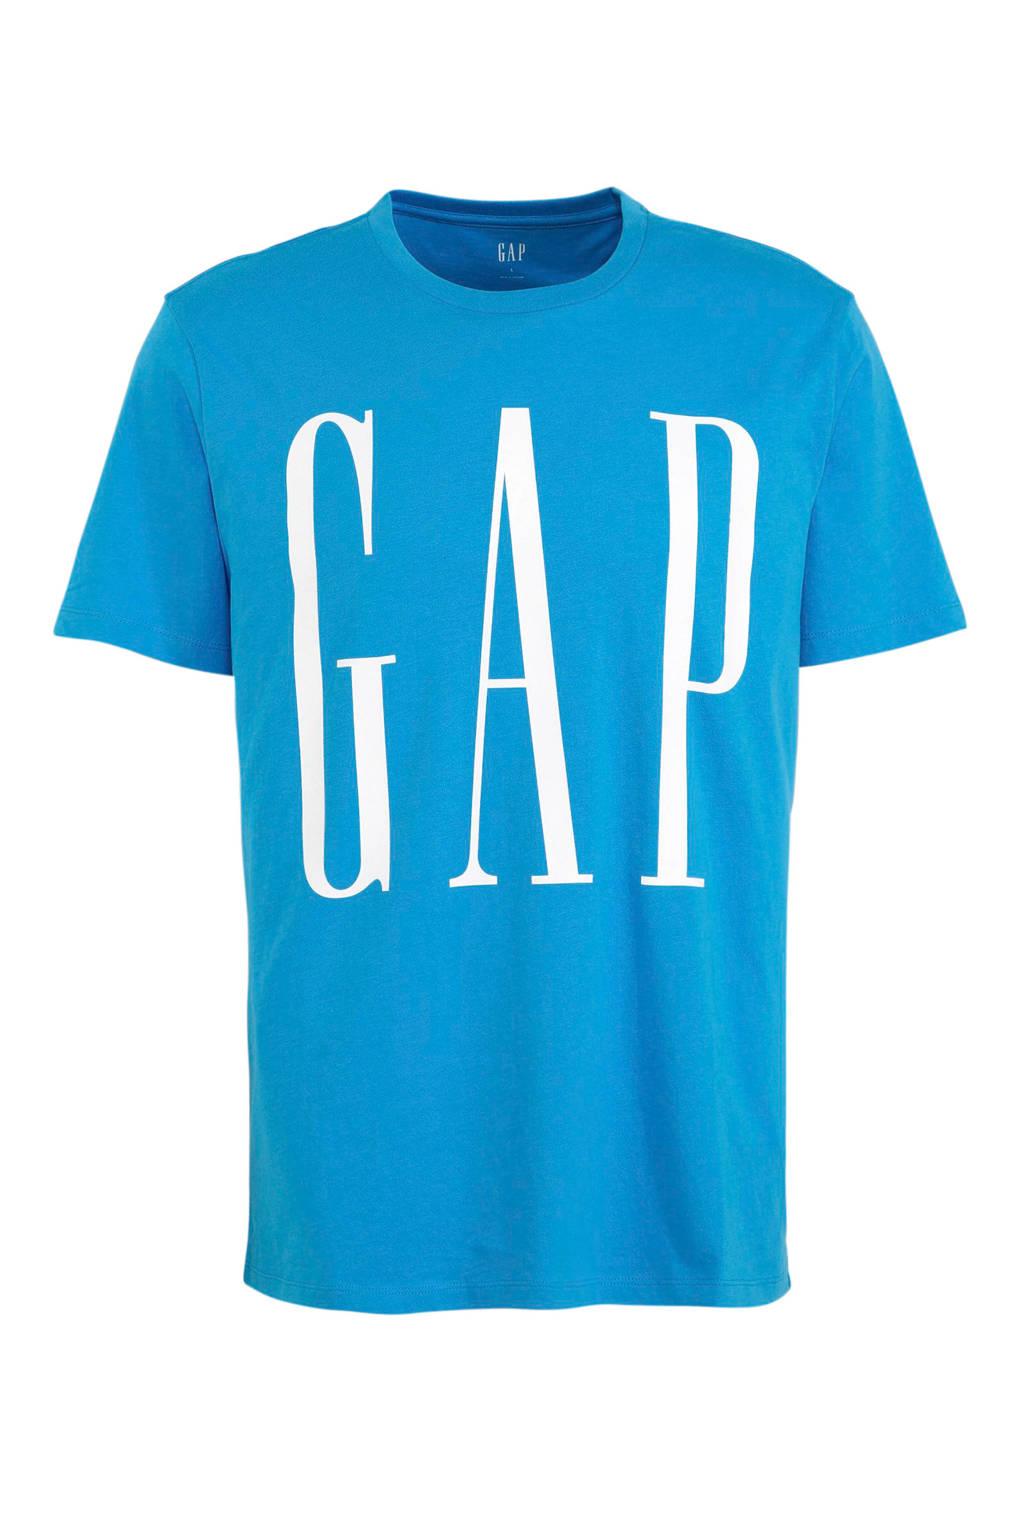 GAP T-shirt met tekst blauw/wit, Blauw/wit